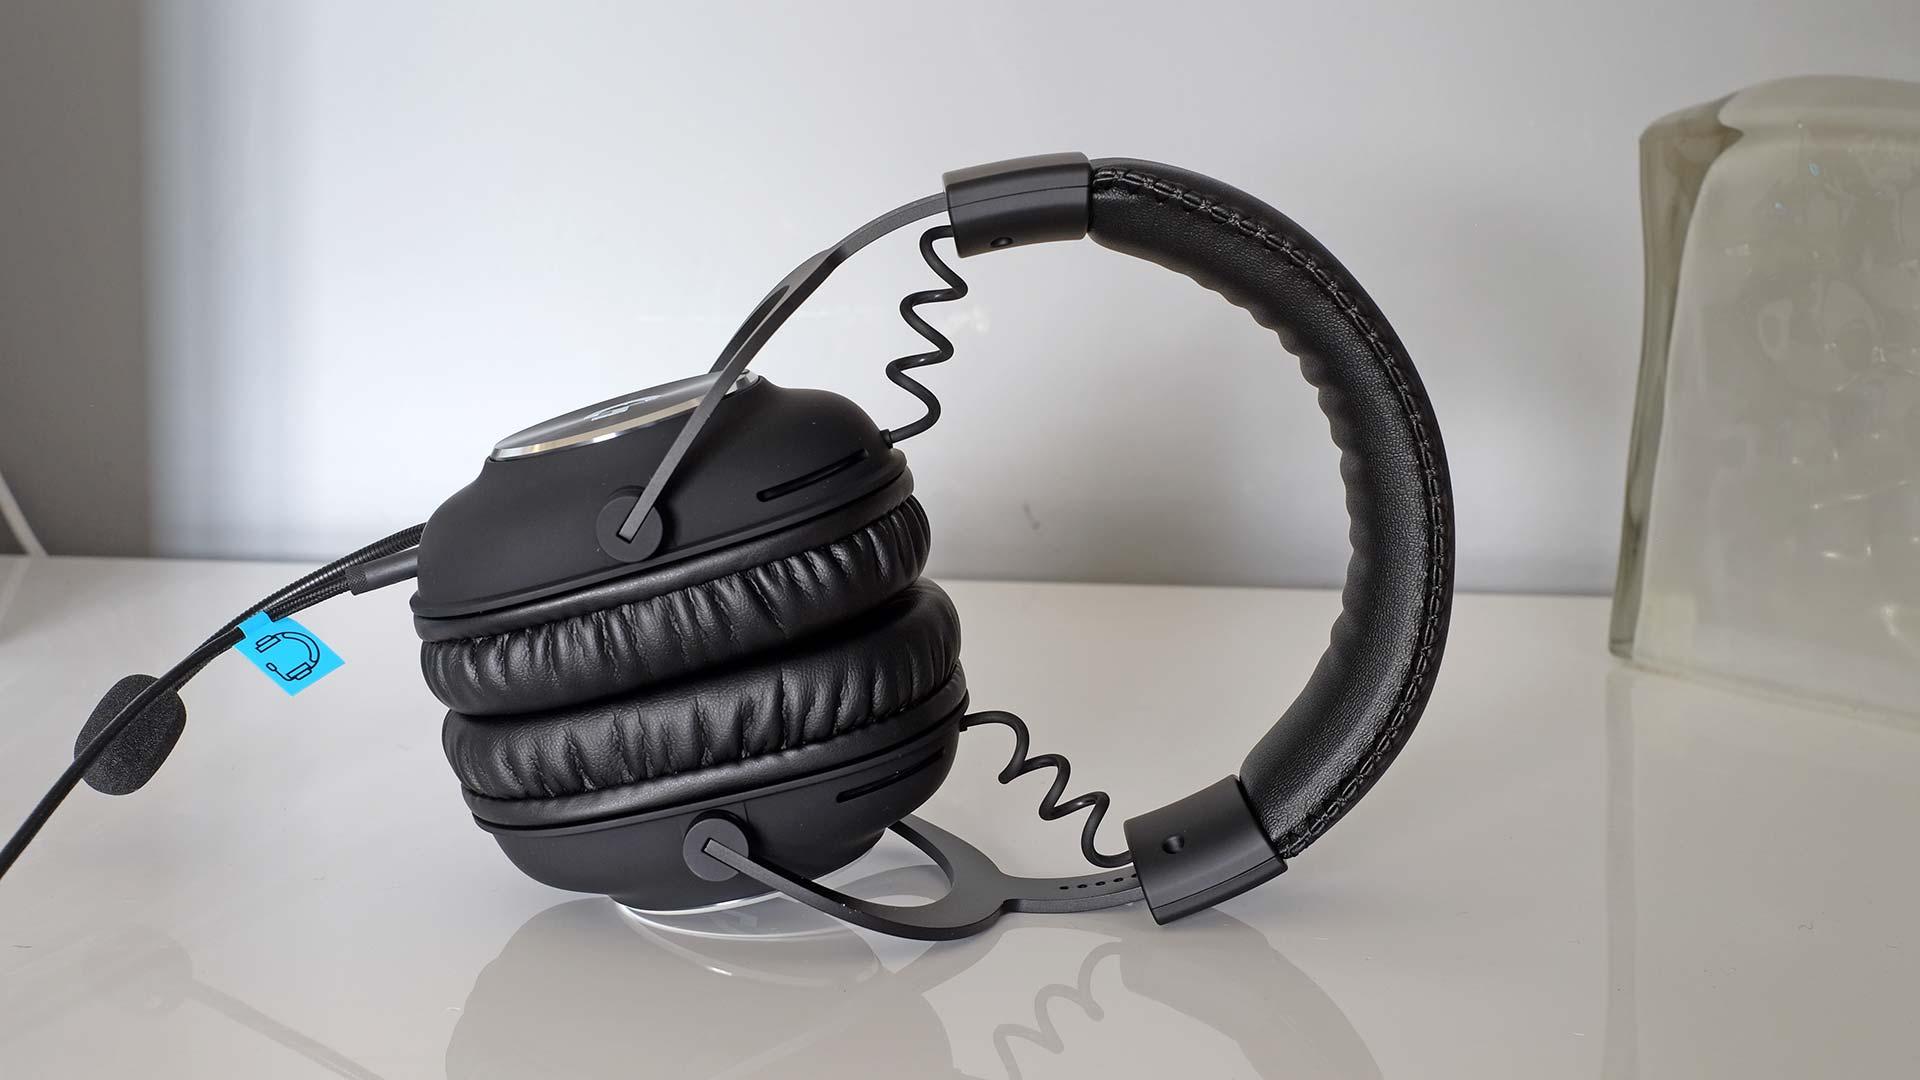 LOGITECH G PRO X 7.1 Gaming Headset